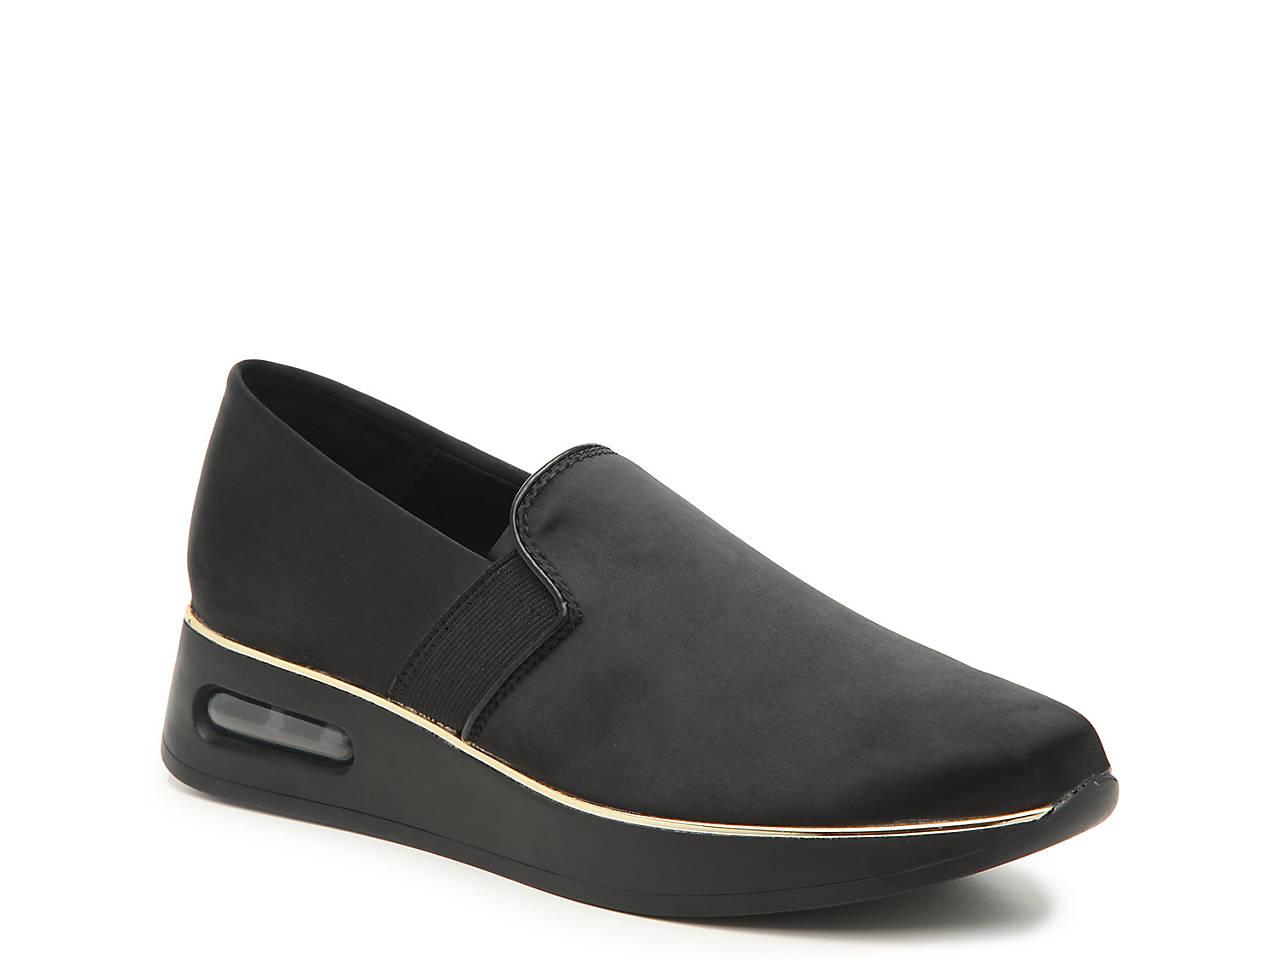 e372f9b288 Karl Lagerfeld Paris Cameo2 Wedge Slip-On Sneaker Women s Shoes